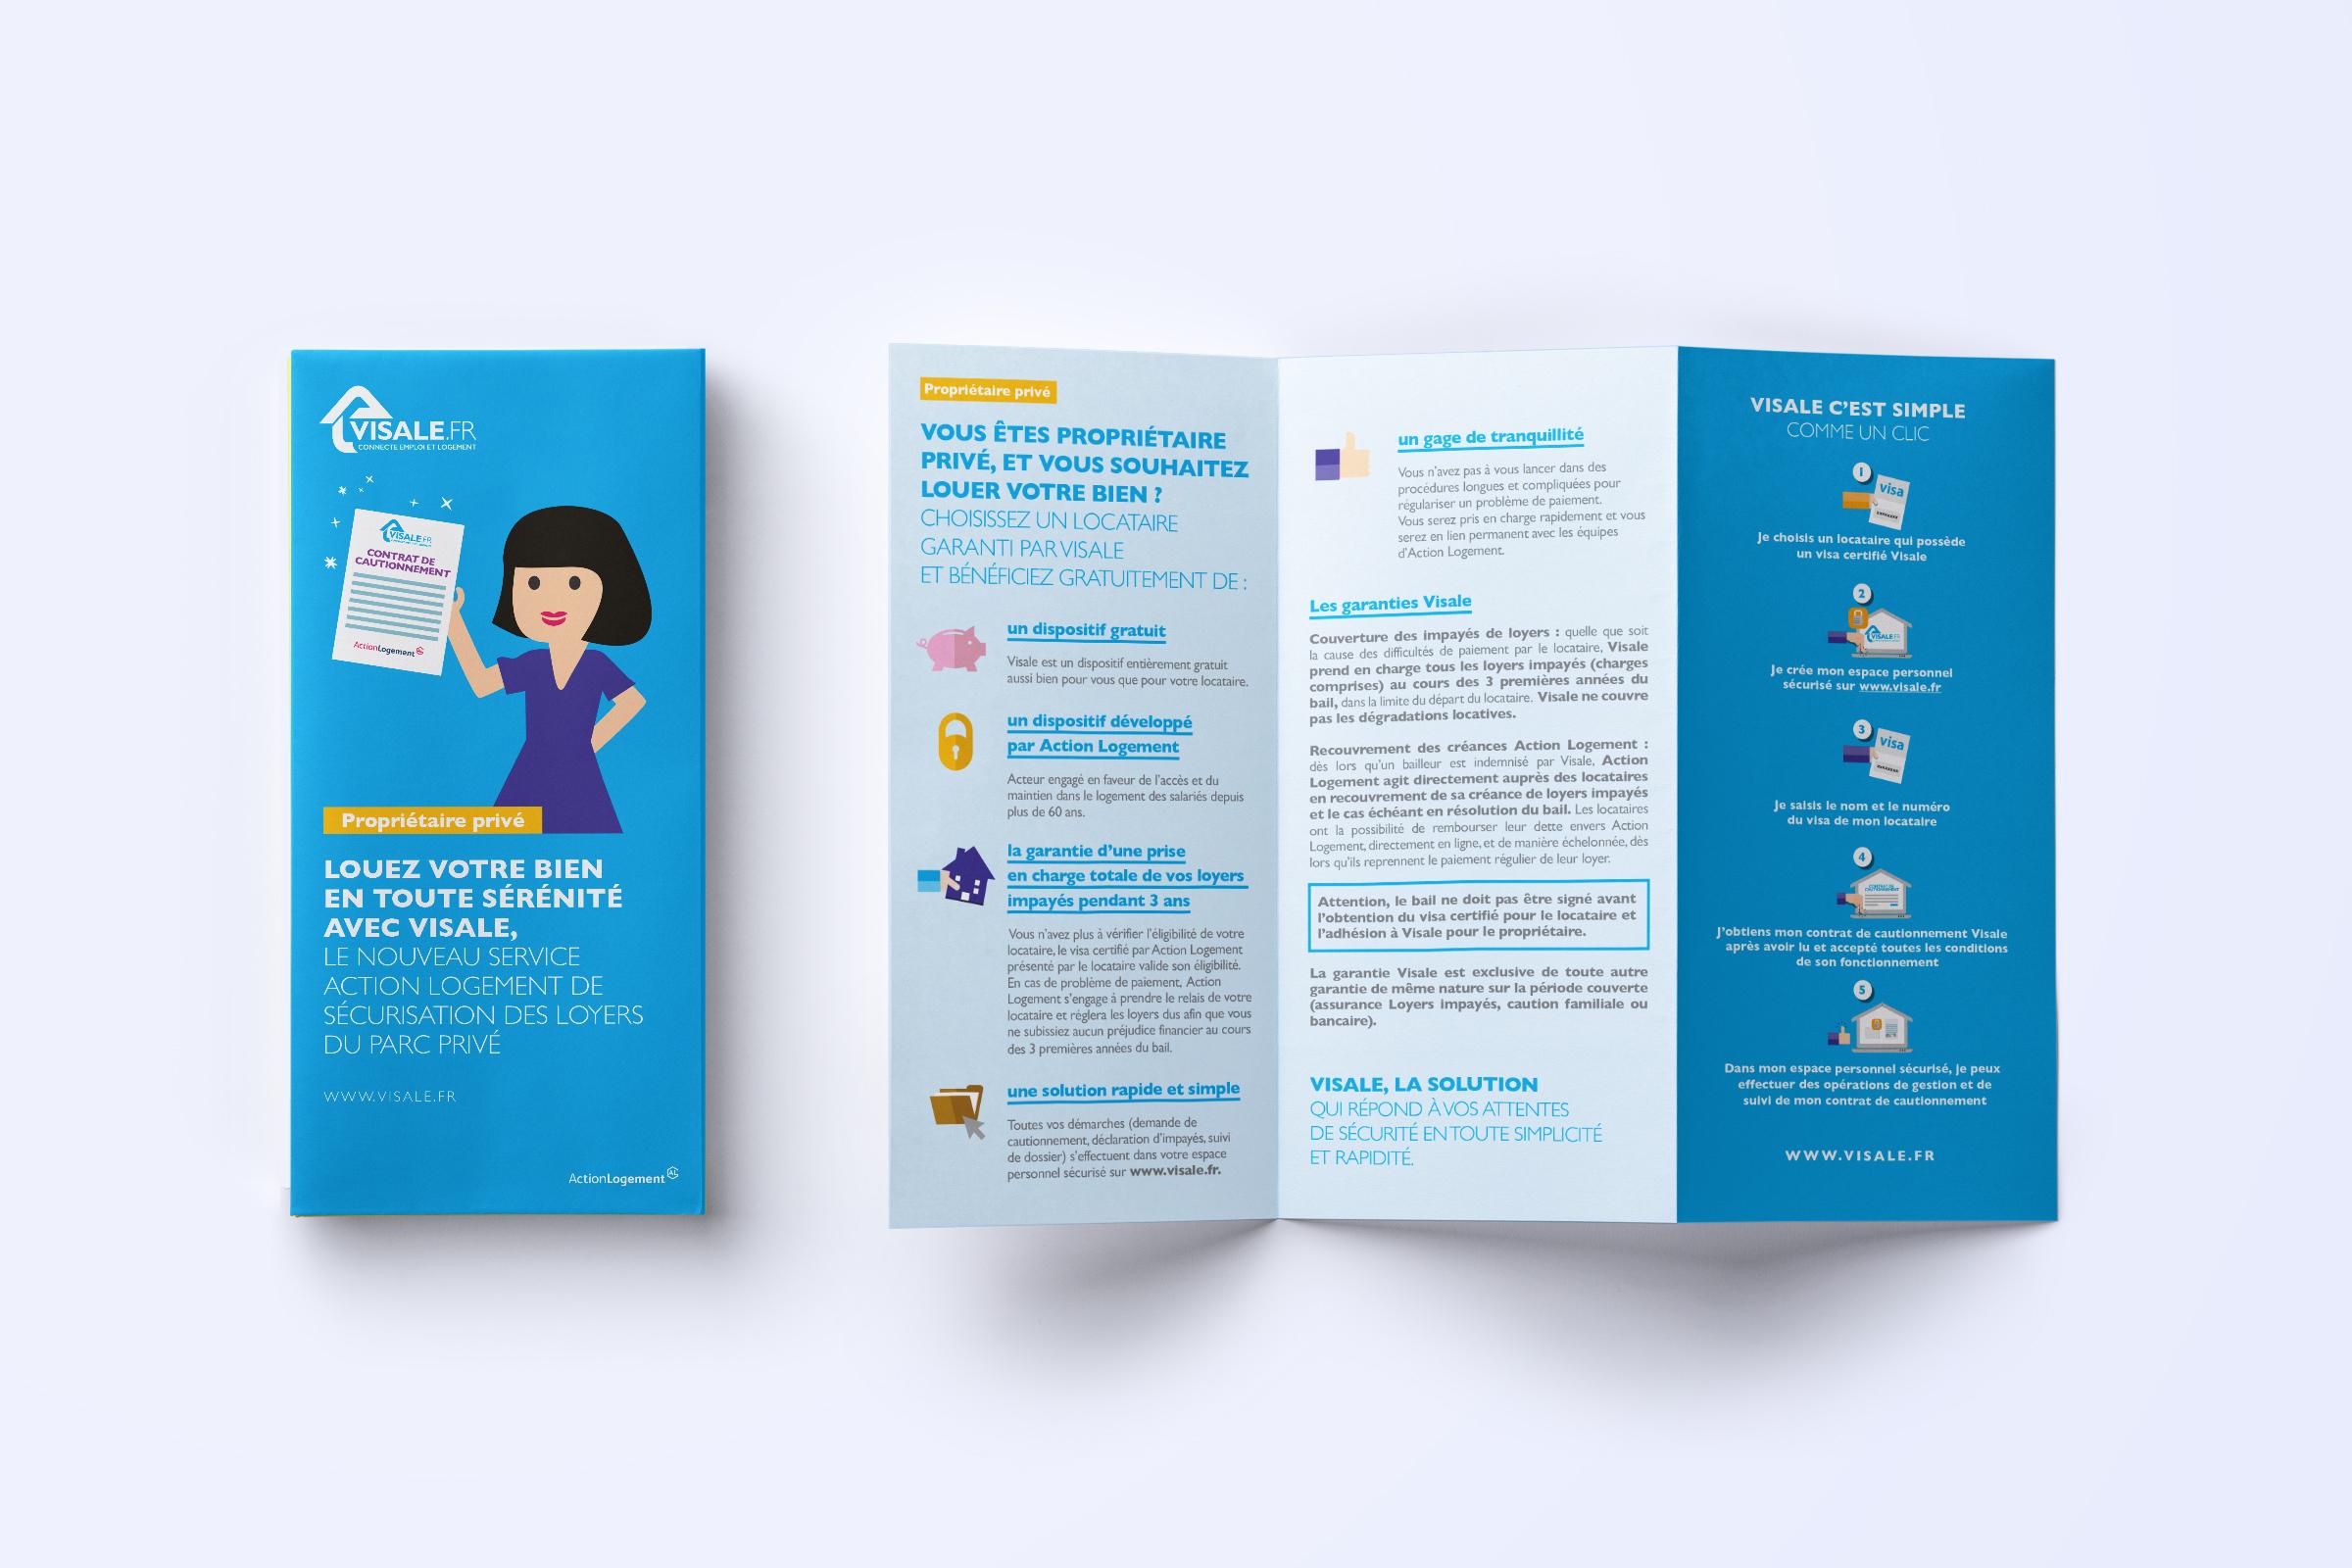 Création leaflet Visale